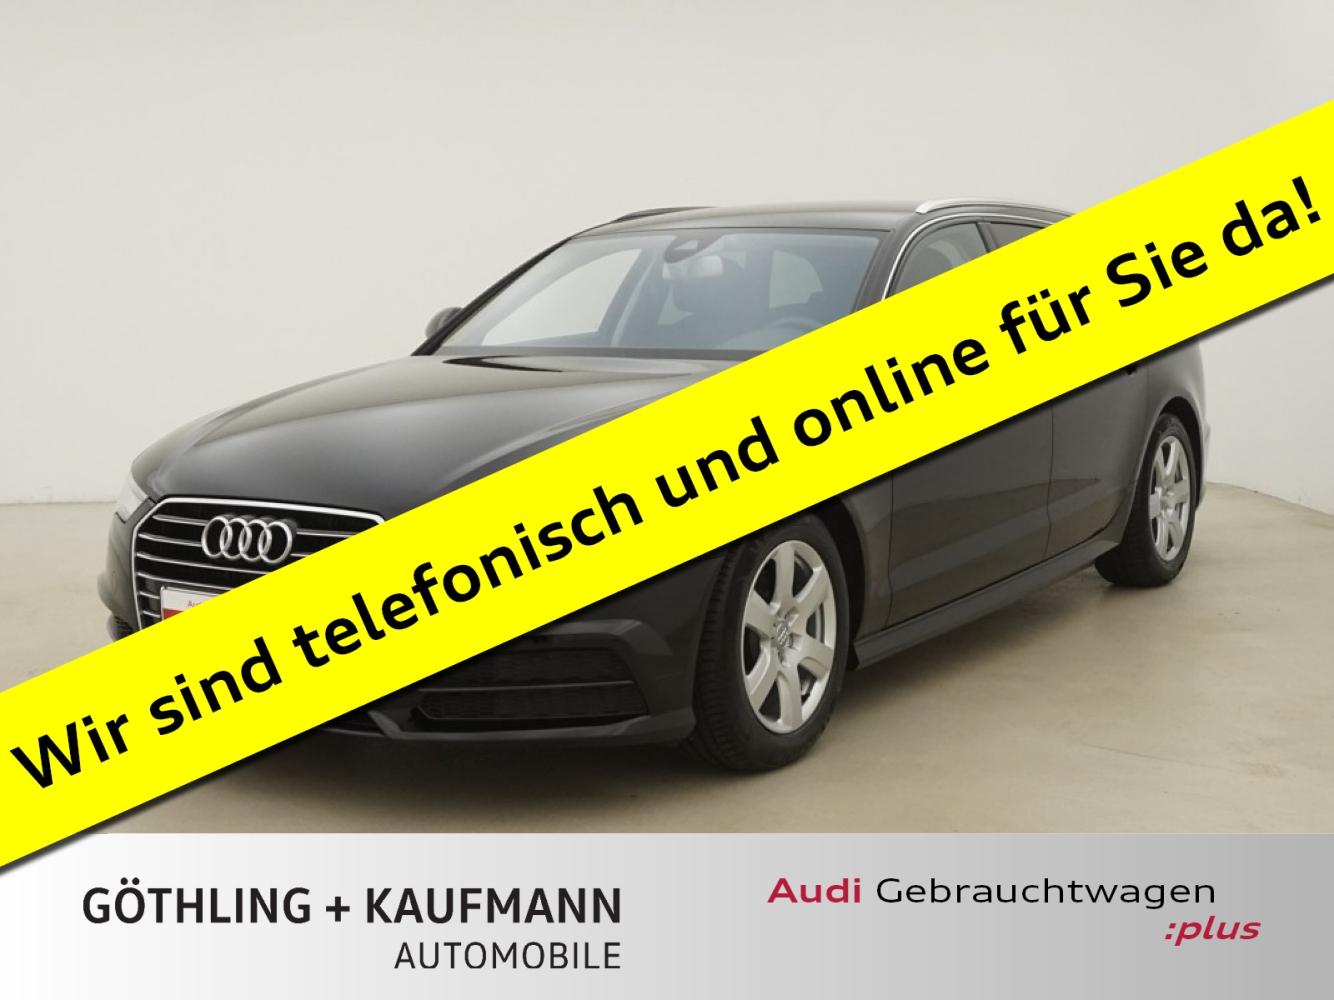 Audi A6 Avant 2.0 TDI ultra S tro. 140 kW*AHK*Kamera*, Jahr 2017, Diesel